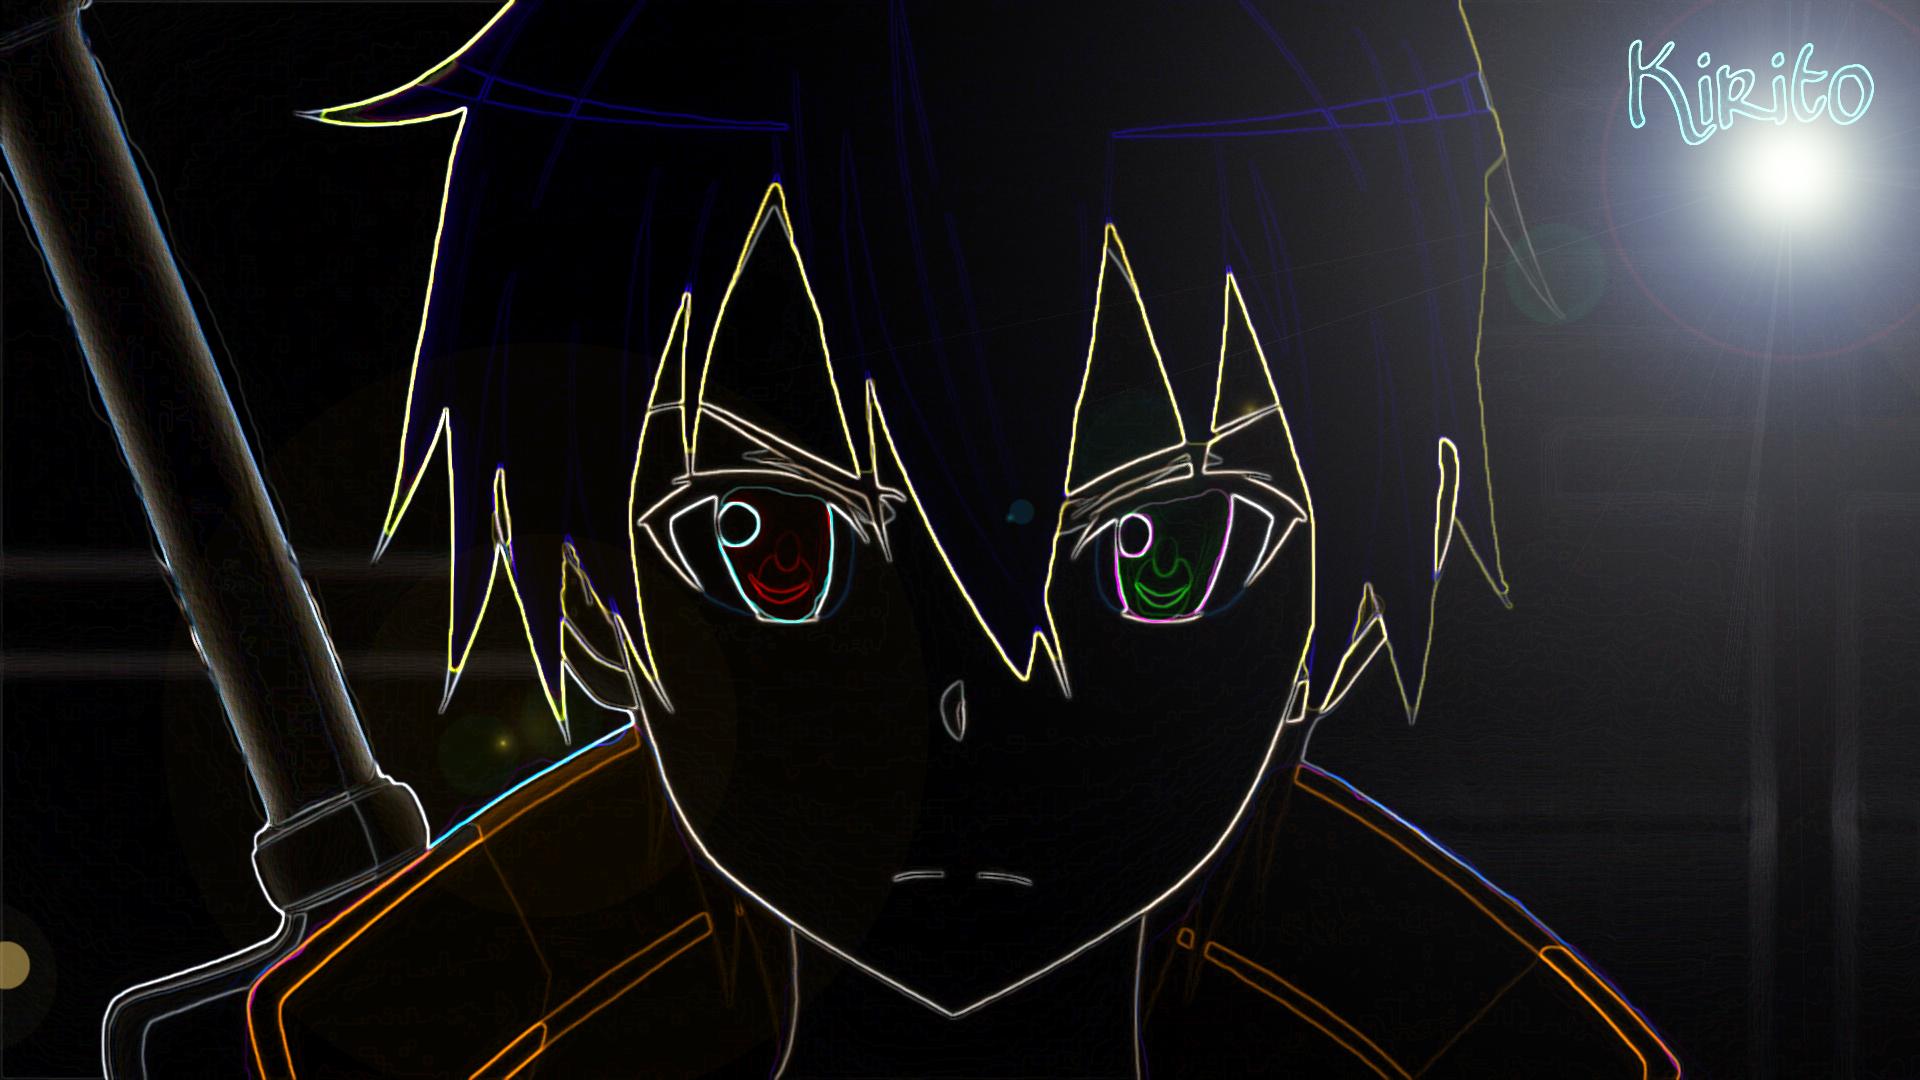 kirito dark wallpaper - photo #3